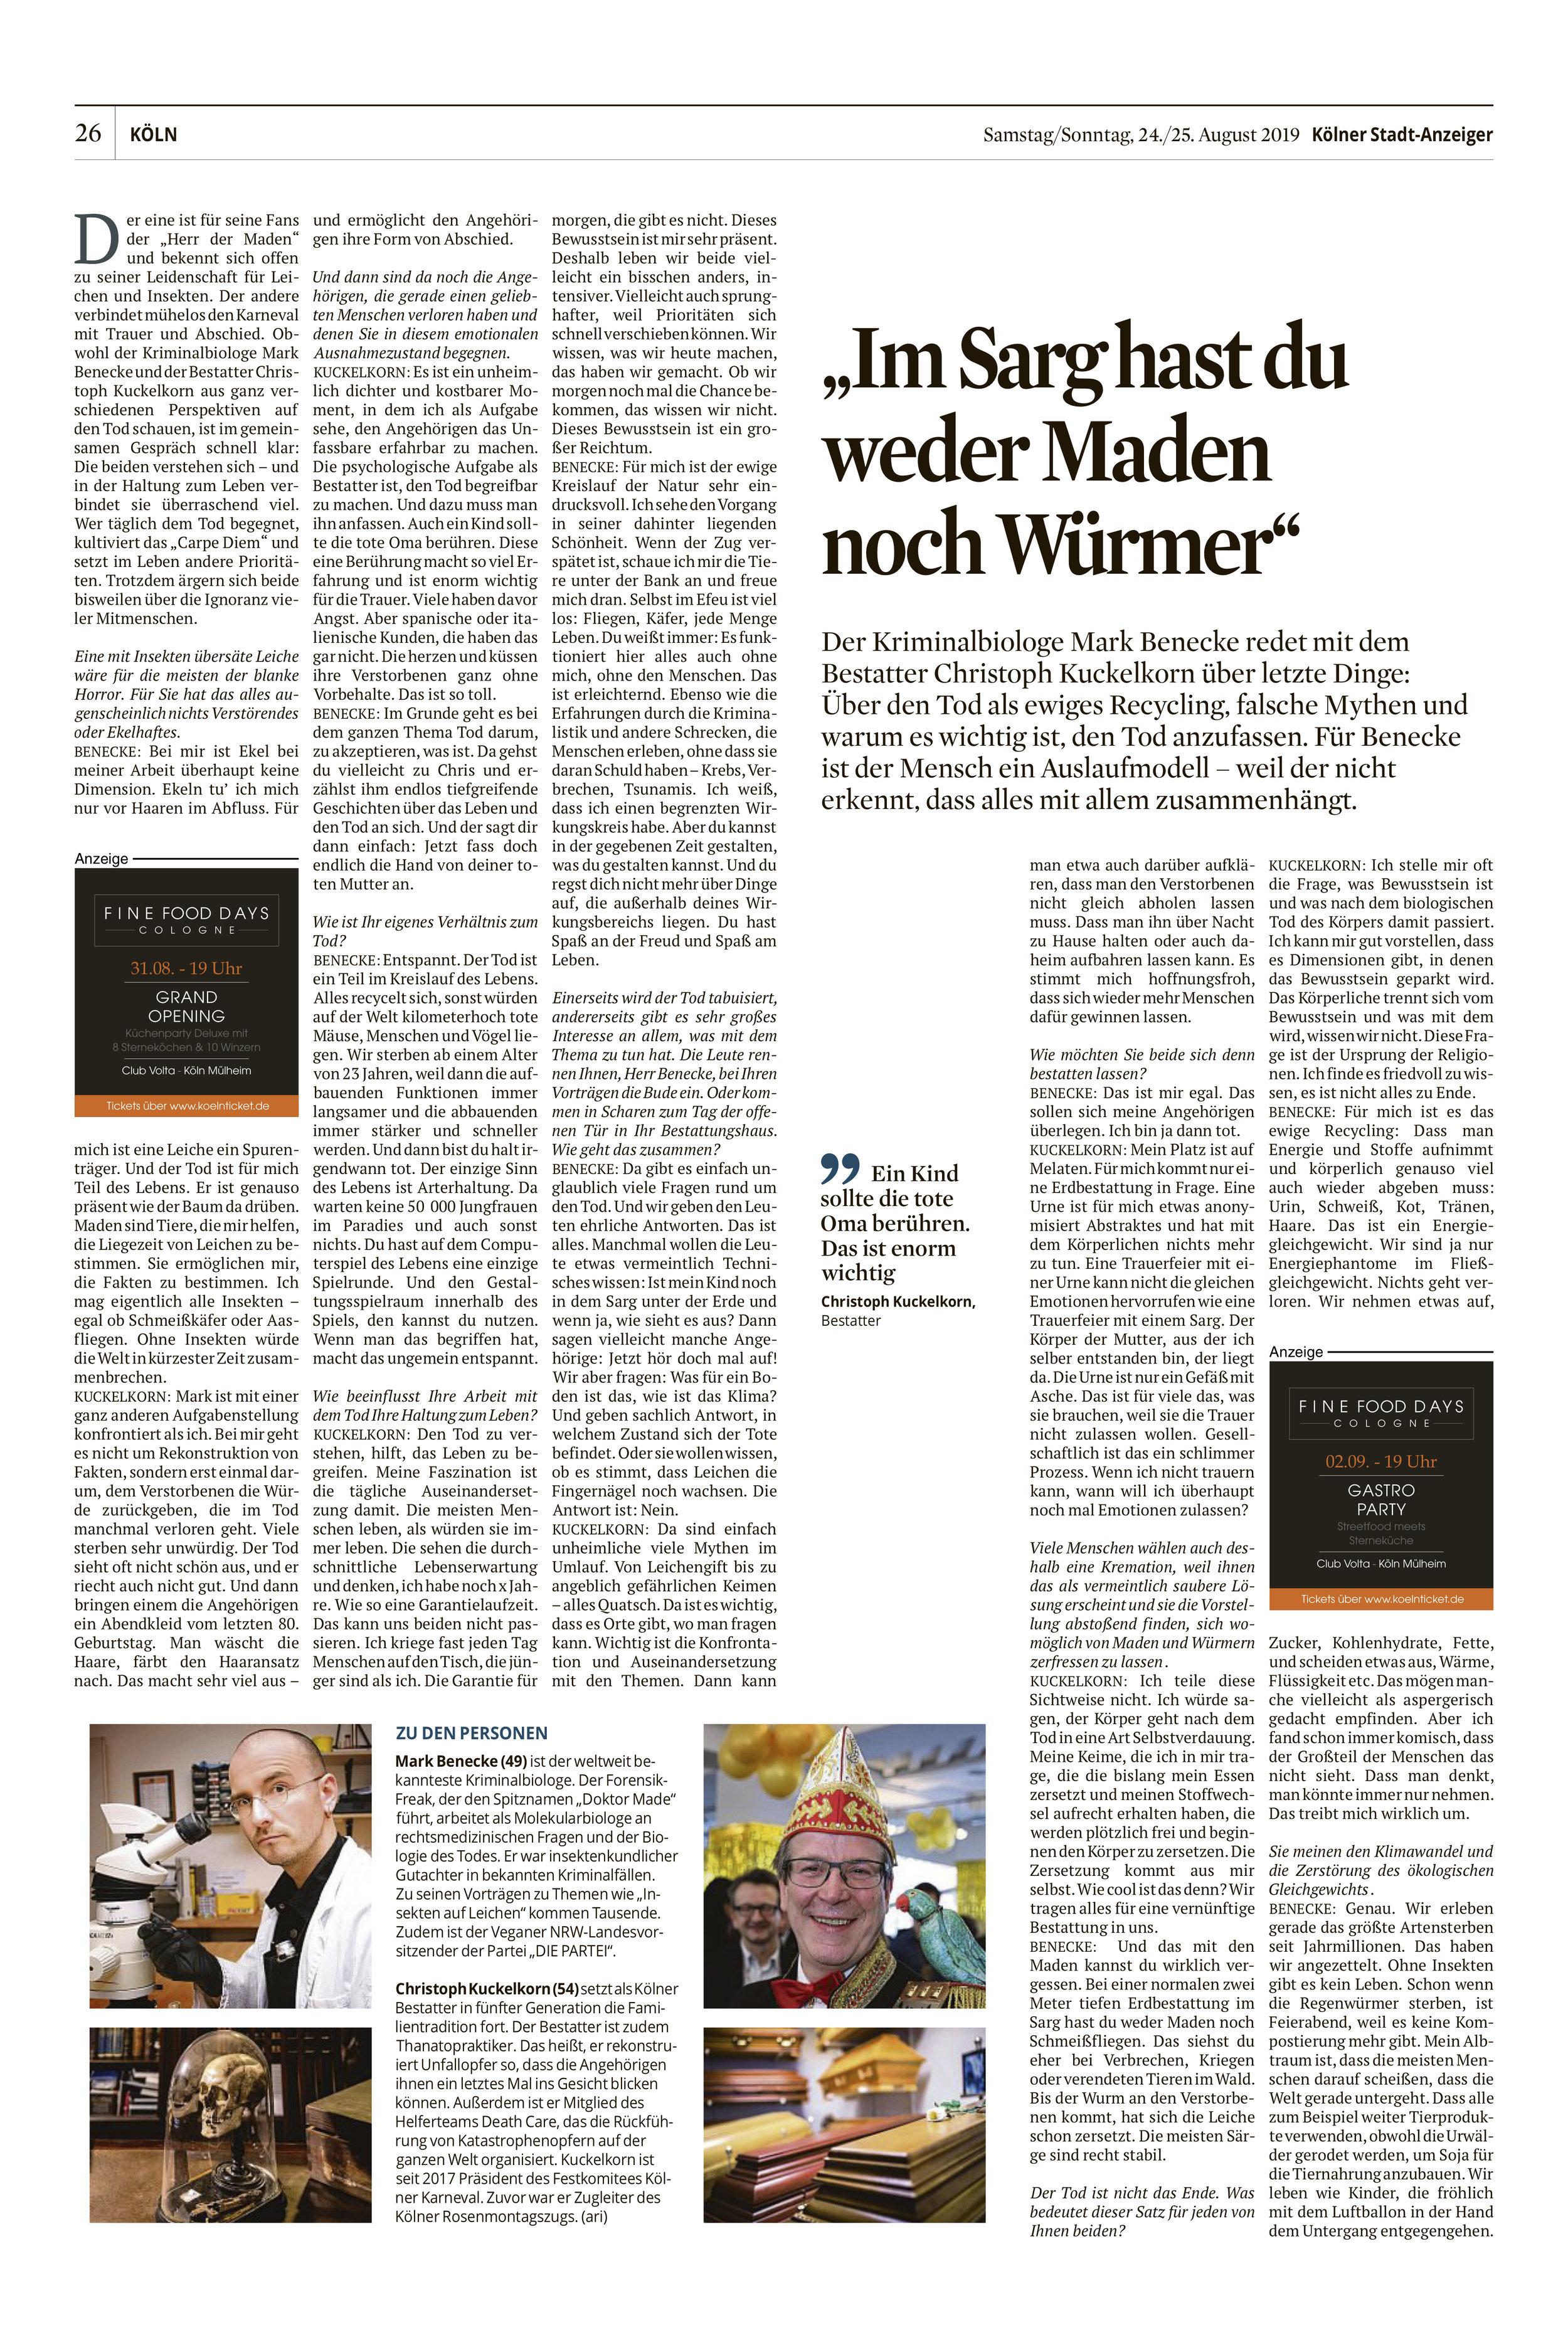 Interview_Kuckelkorn_Mark_Benecke_Tod_KStA_1.jpg